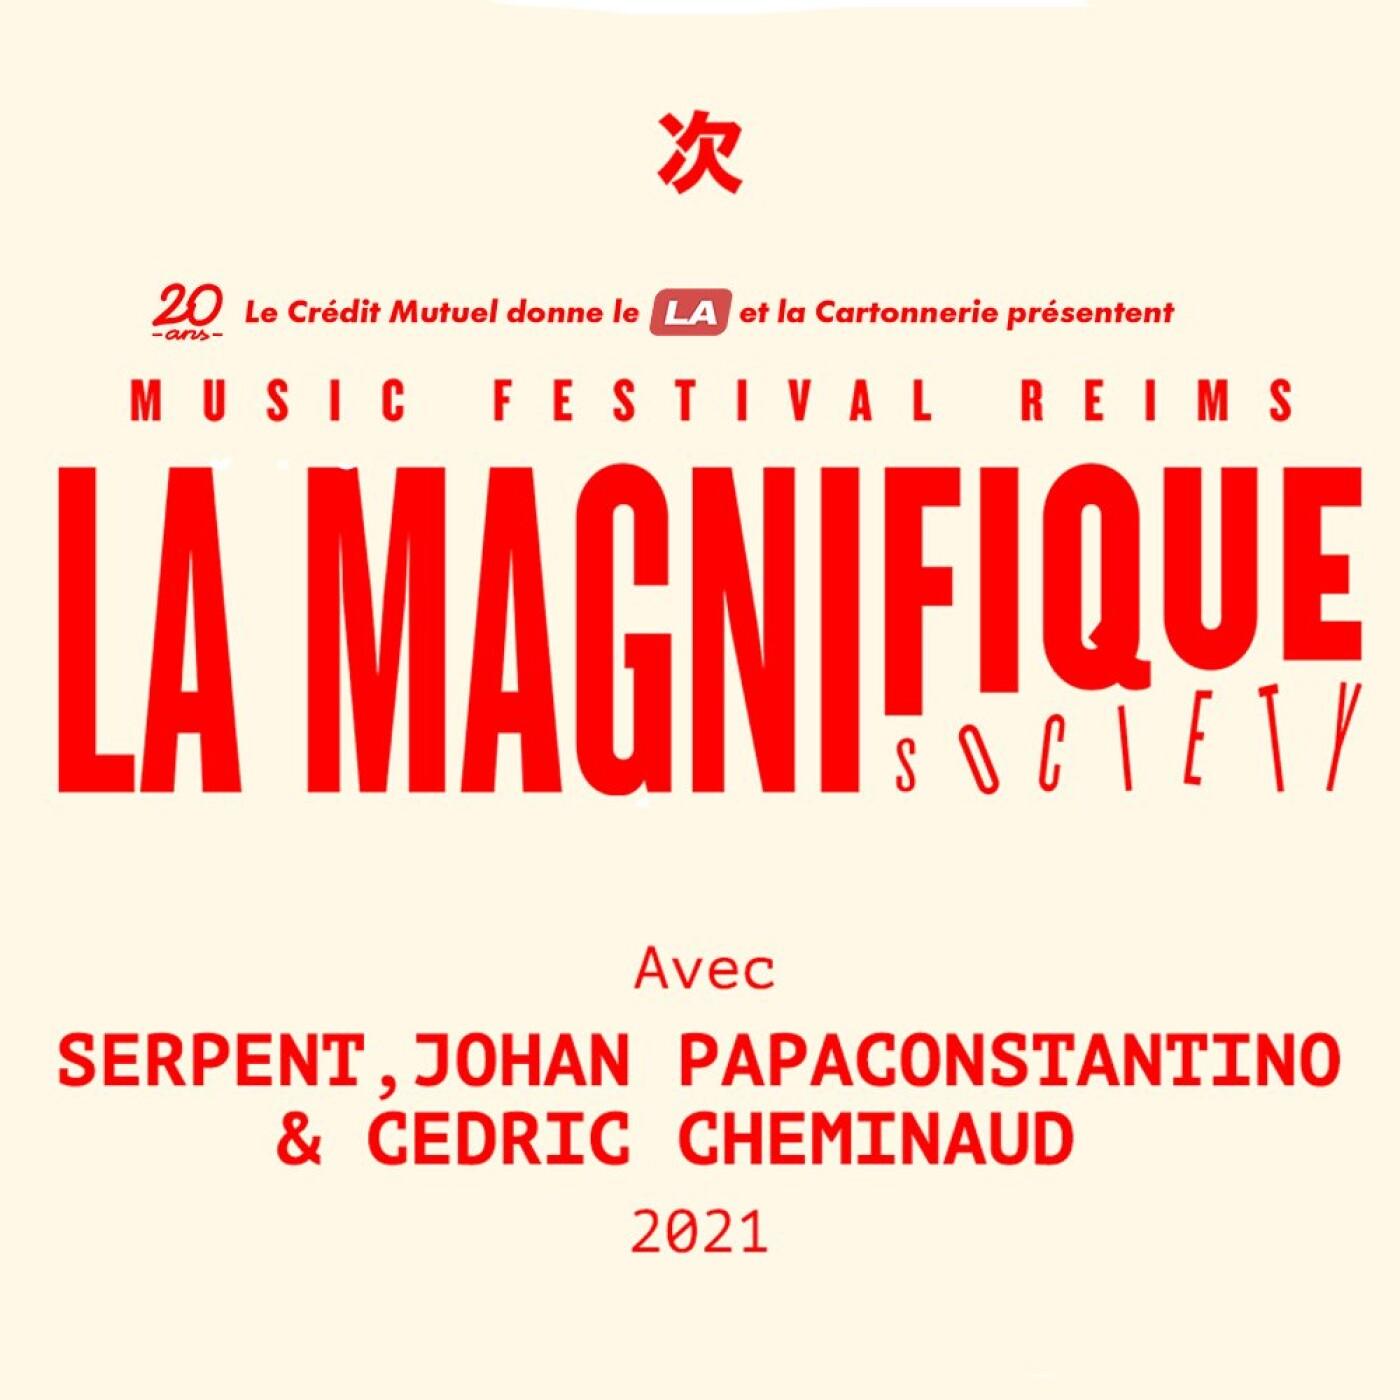 La Magnifique Society : Serpent & Johan Papaconstantino